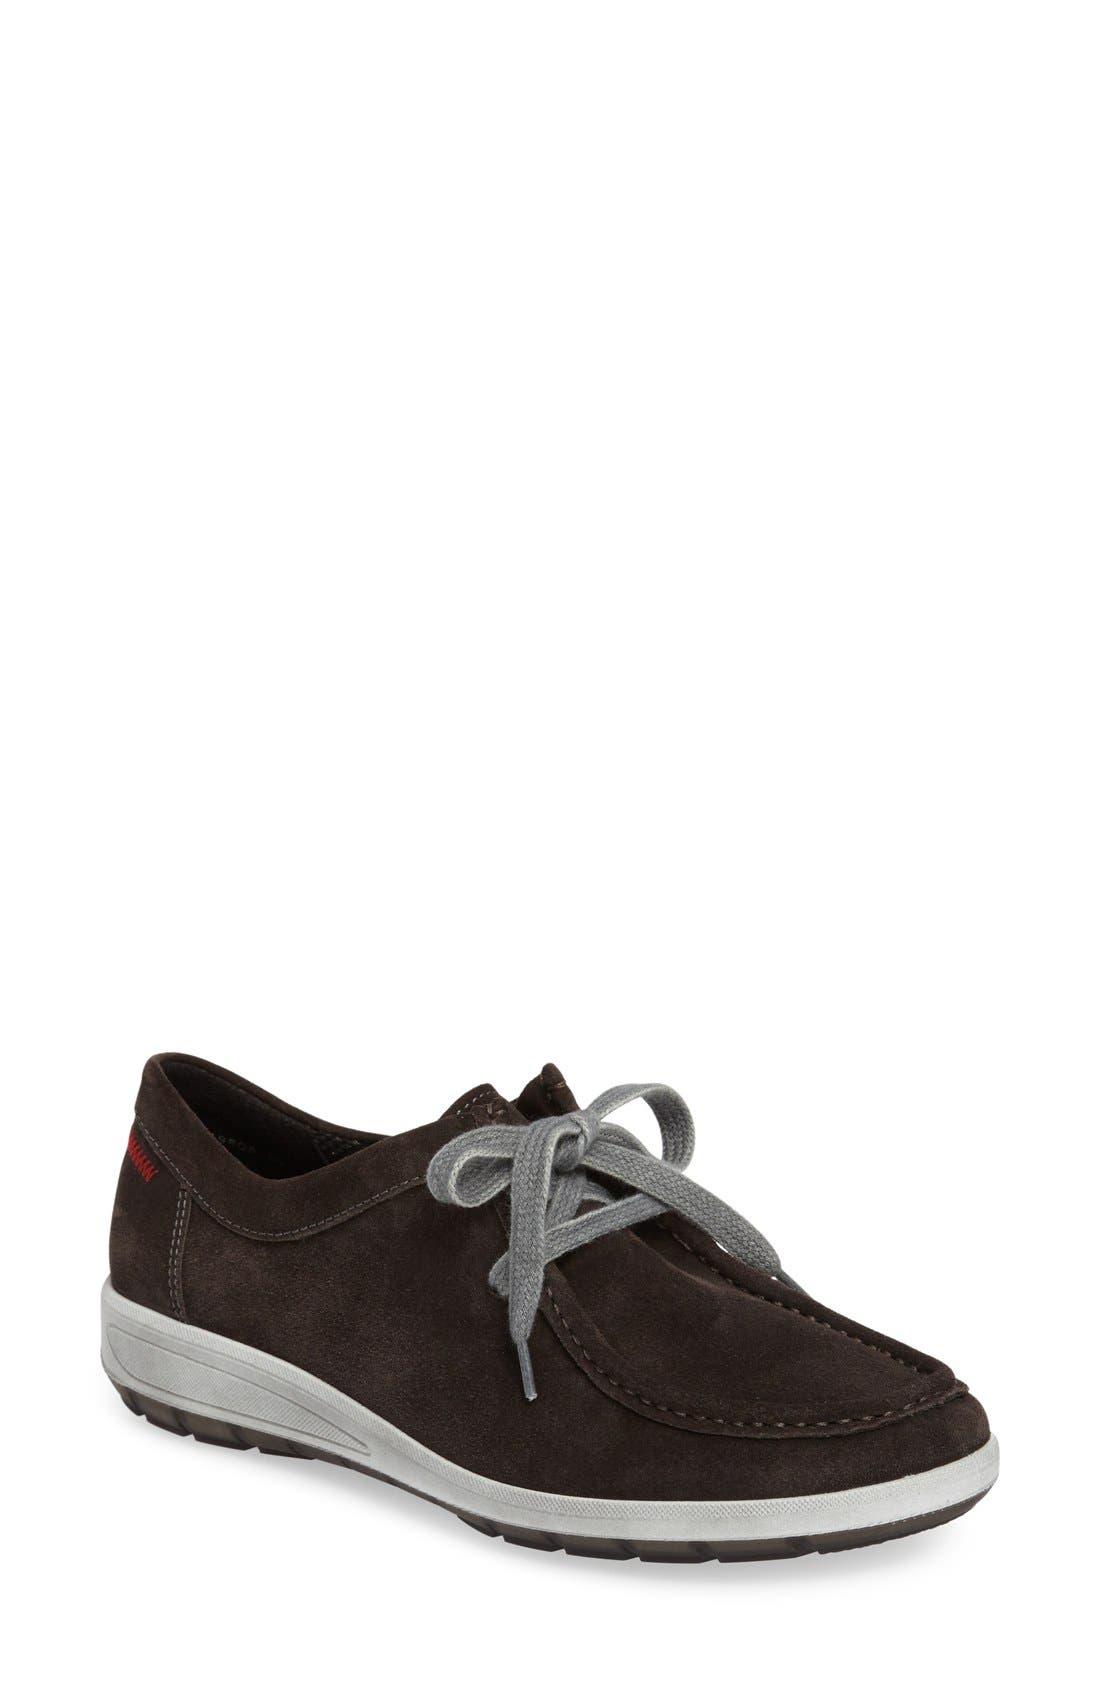 Trista Sneaker,                         Main,                         color, LAVA SUEDE